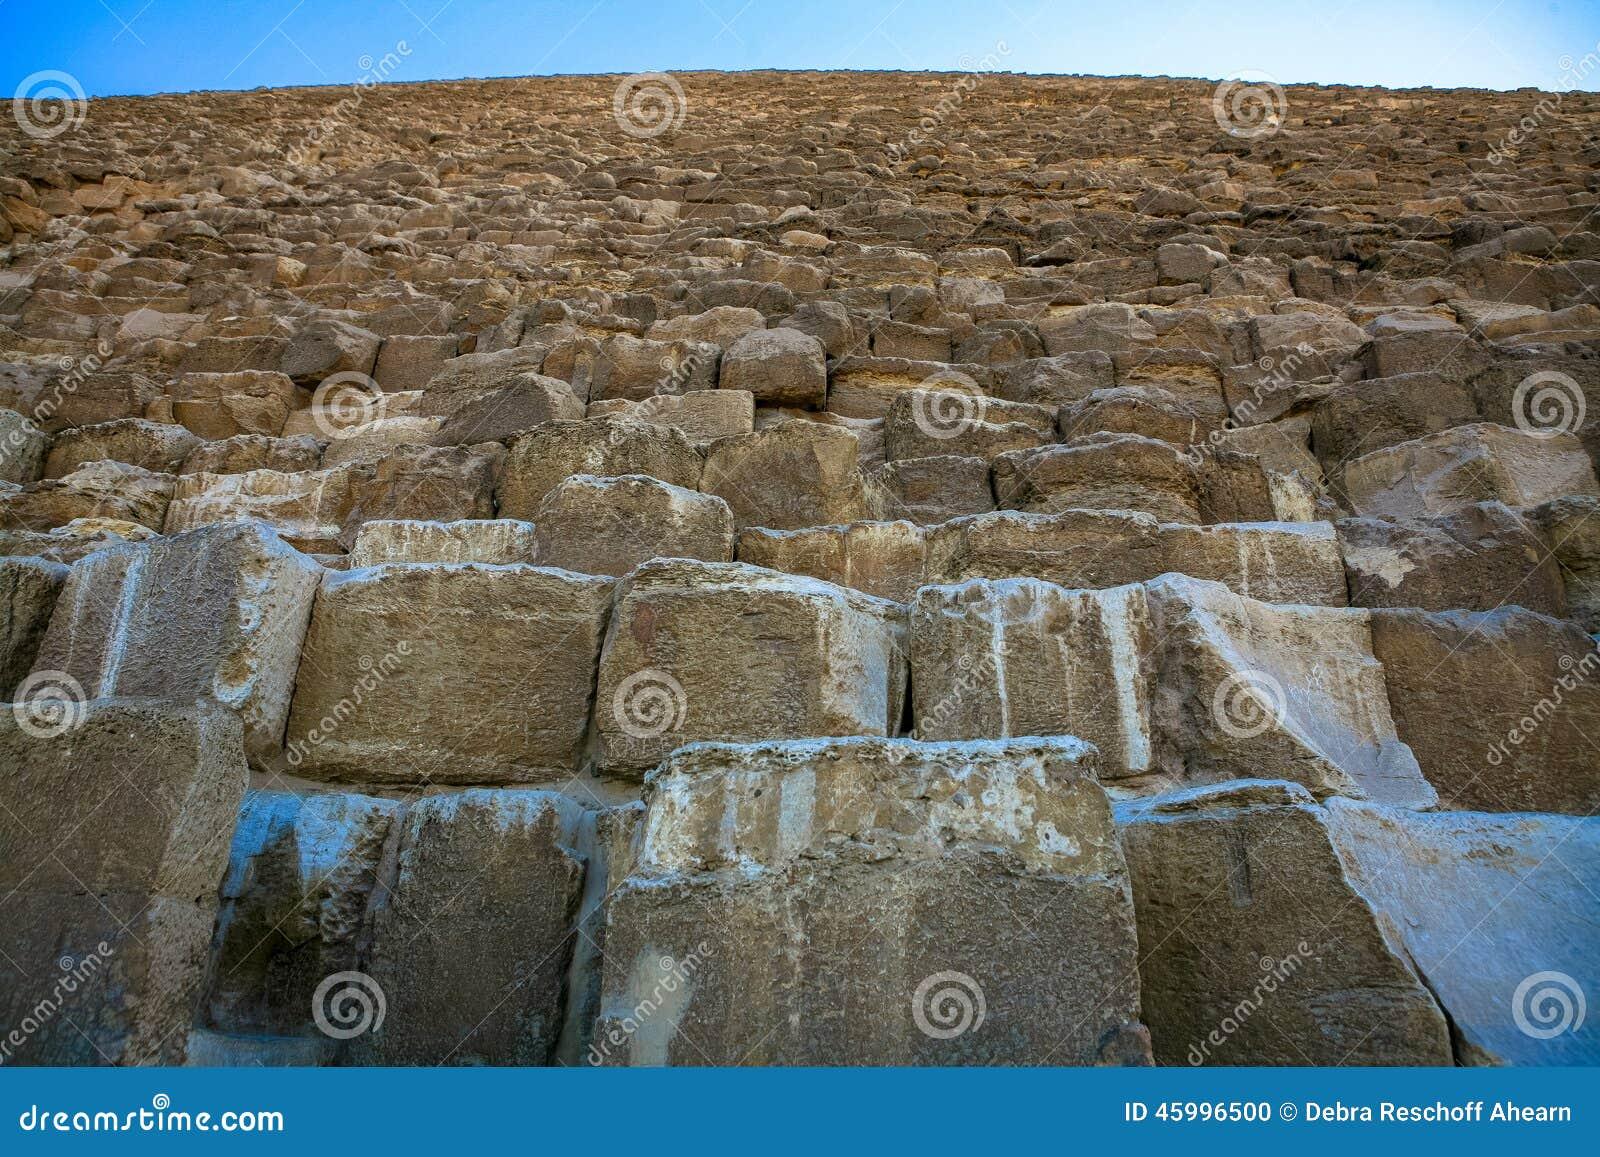 Pedras maciças da grande pirâmide de Giza